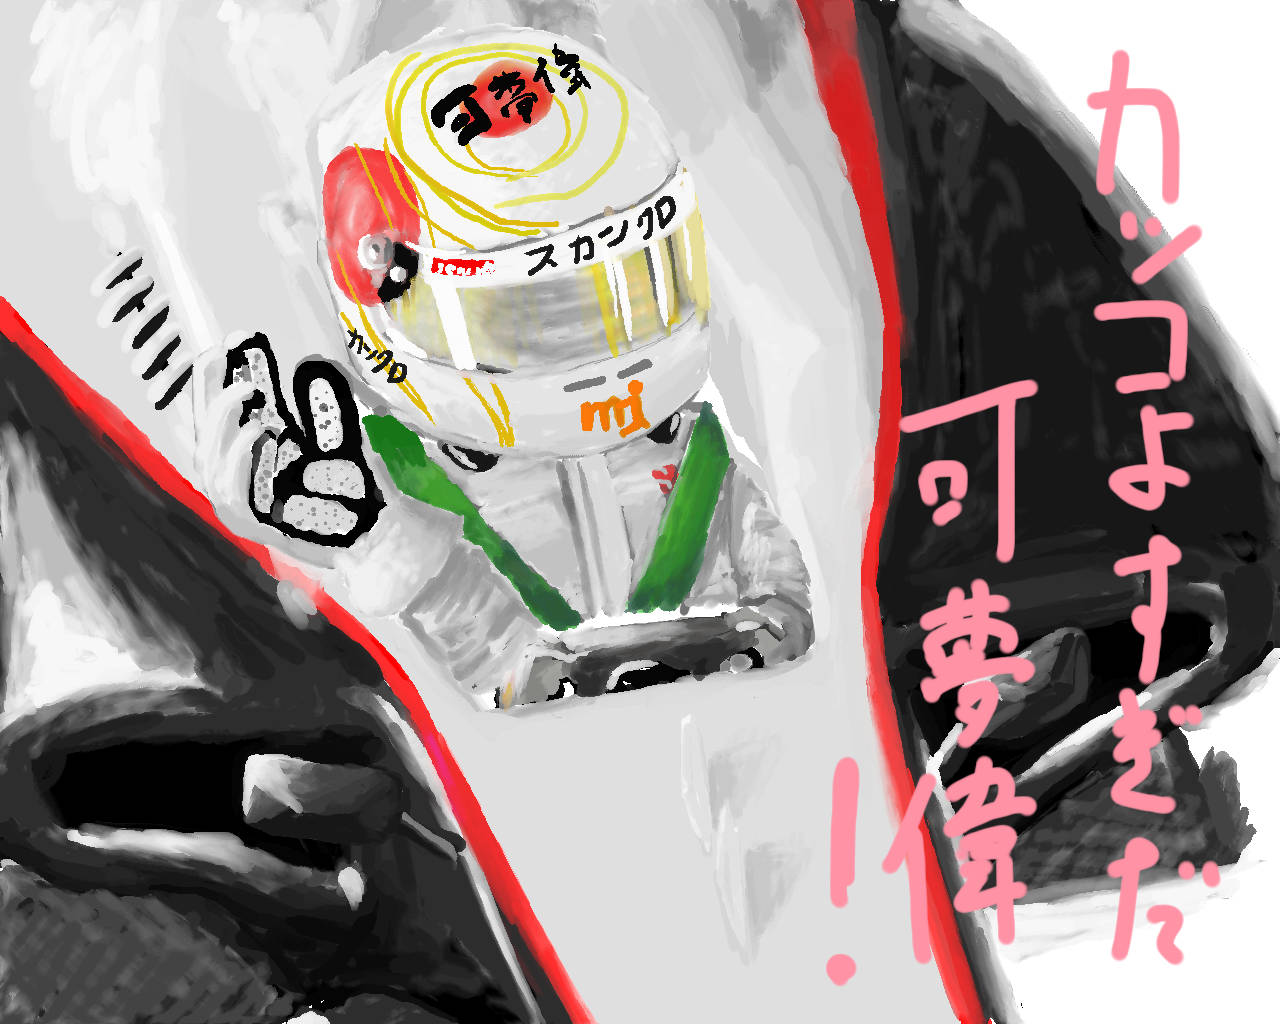 рисунок Камуи Кобаяши на Гран-при Японии 2010